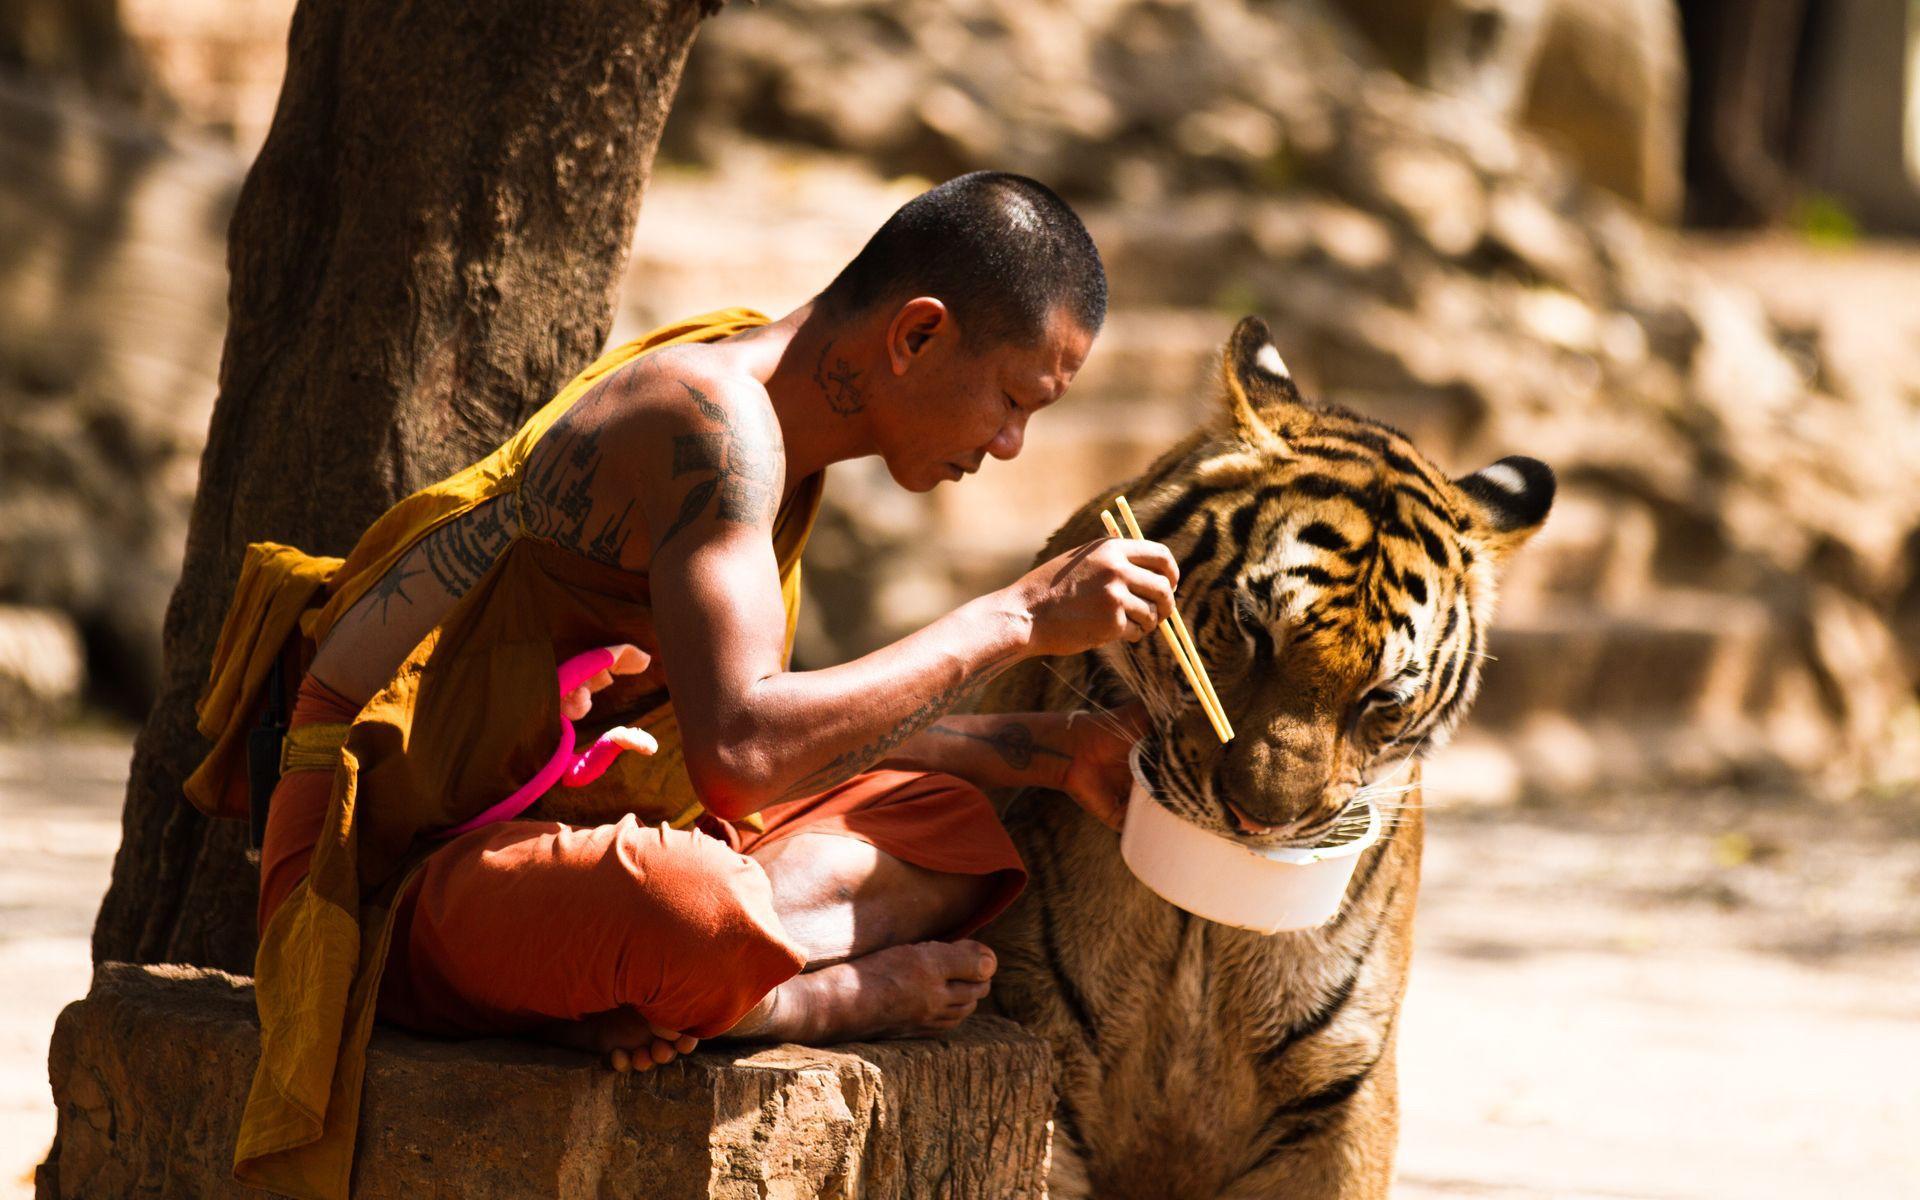 Tiger Buddhism Monks Anime